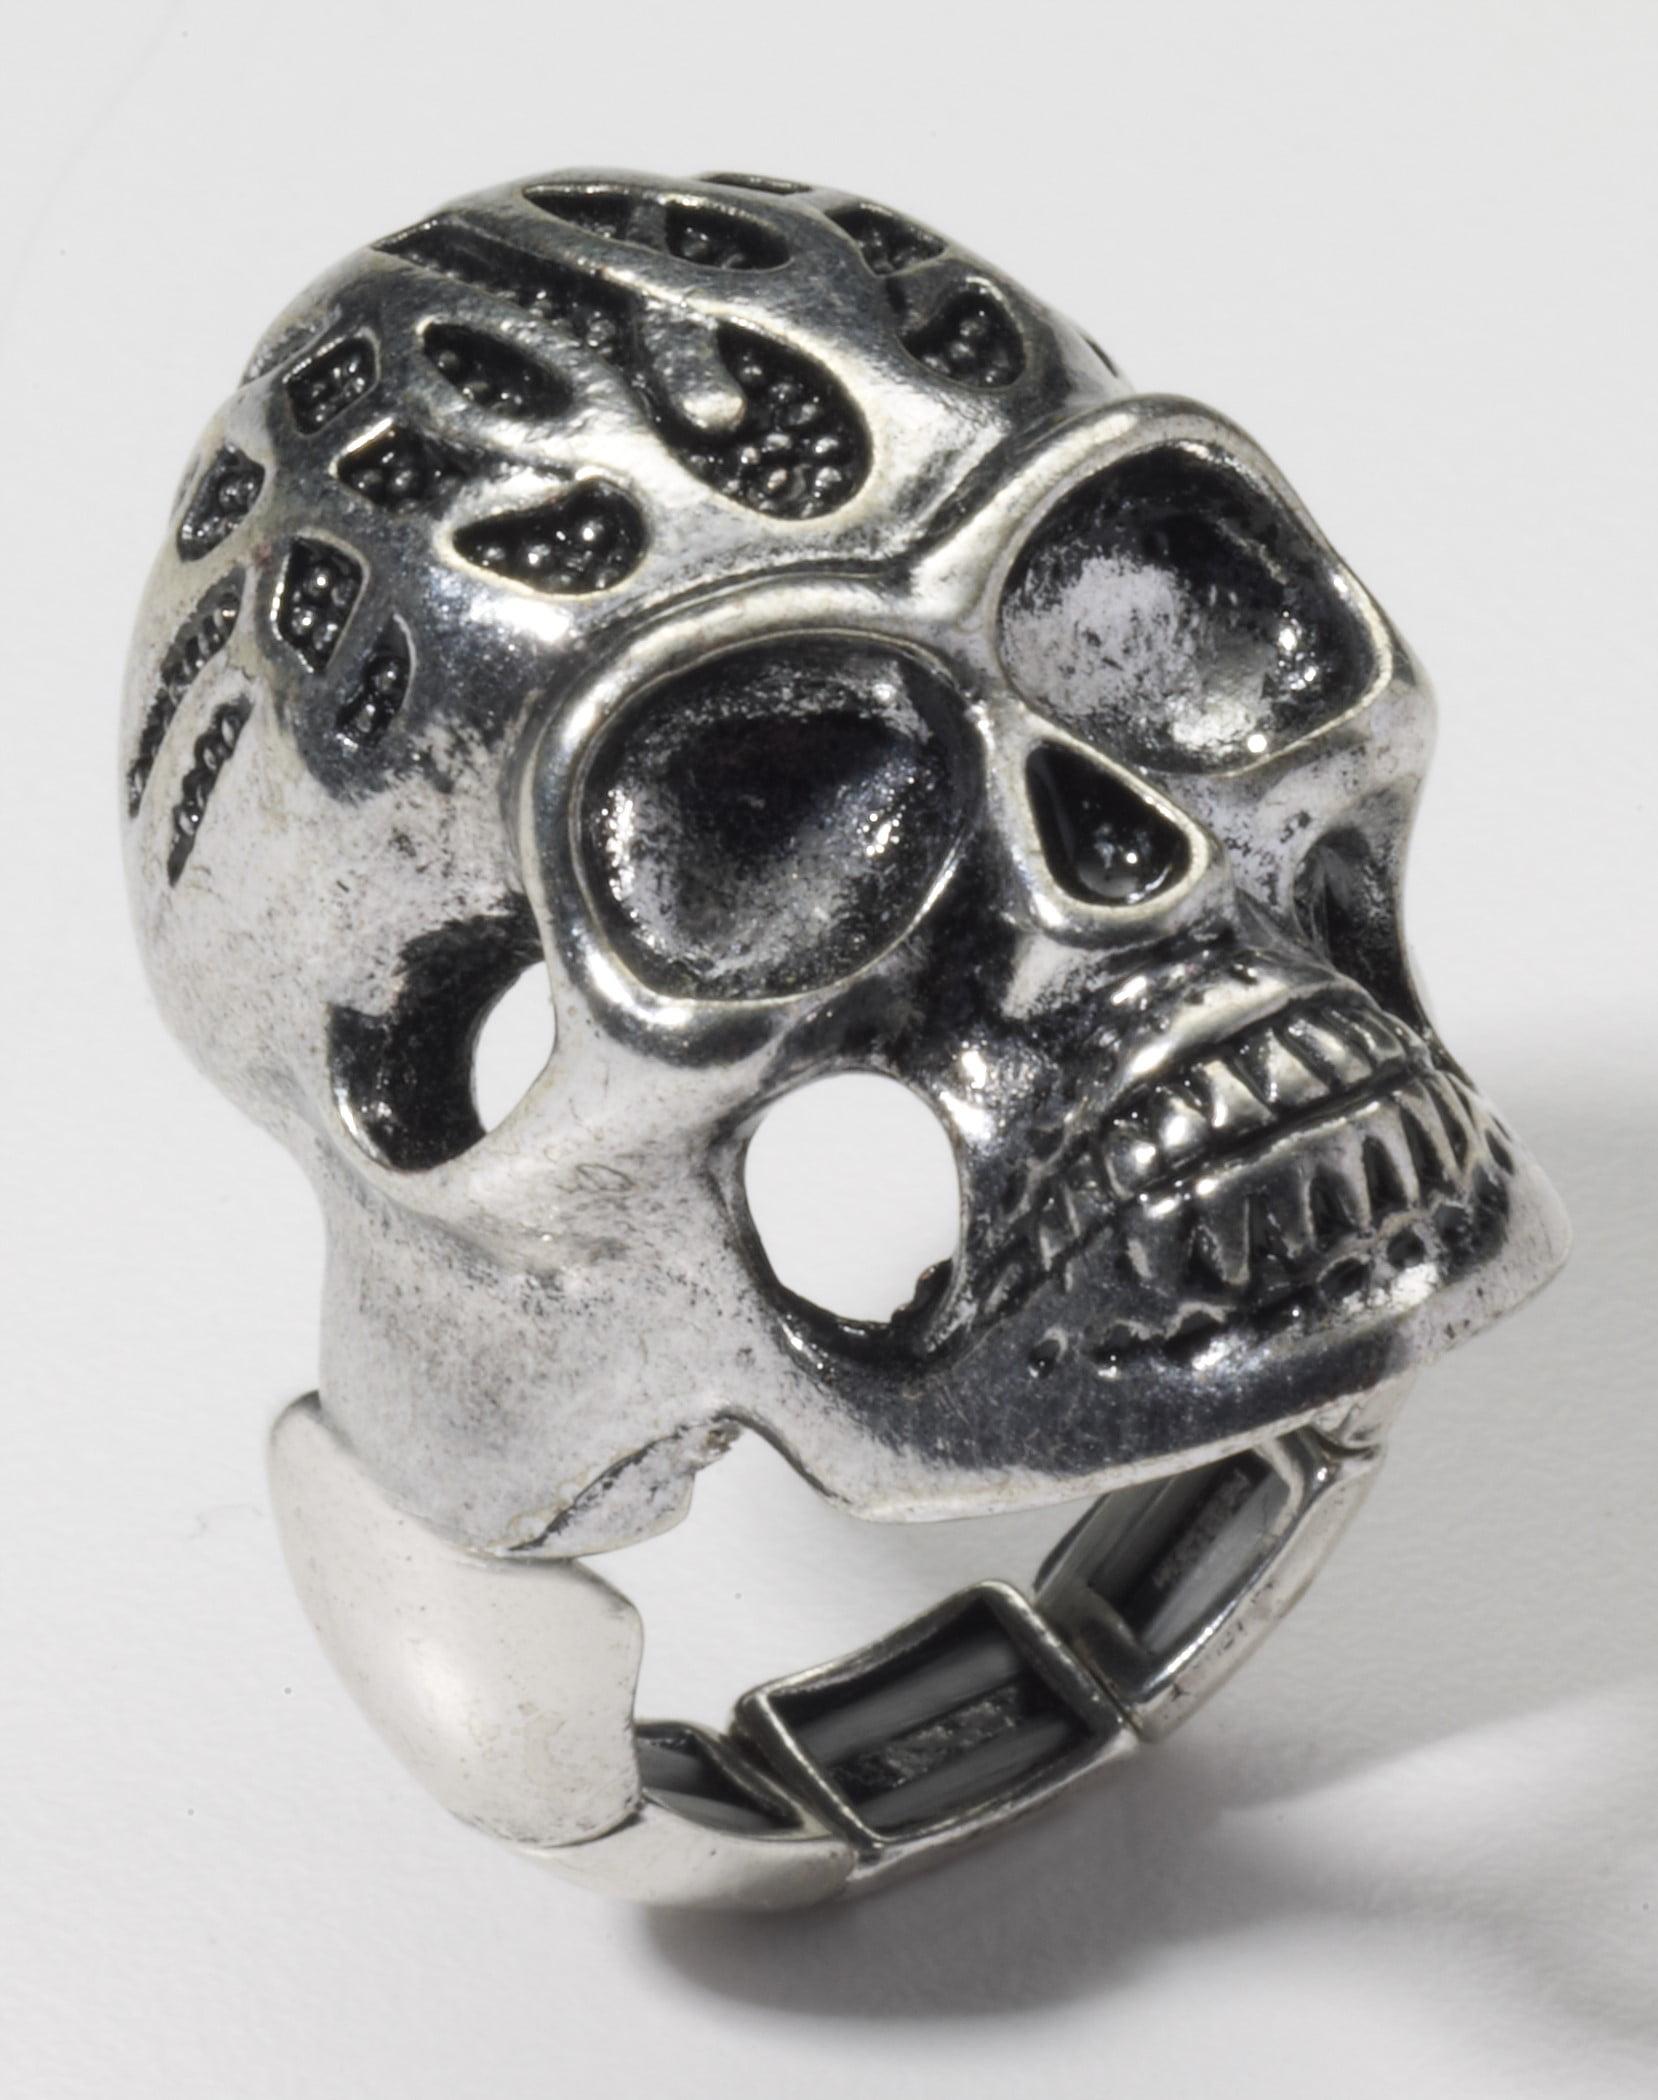 Biker Skull Ring Costume Jewelry Adult